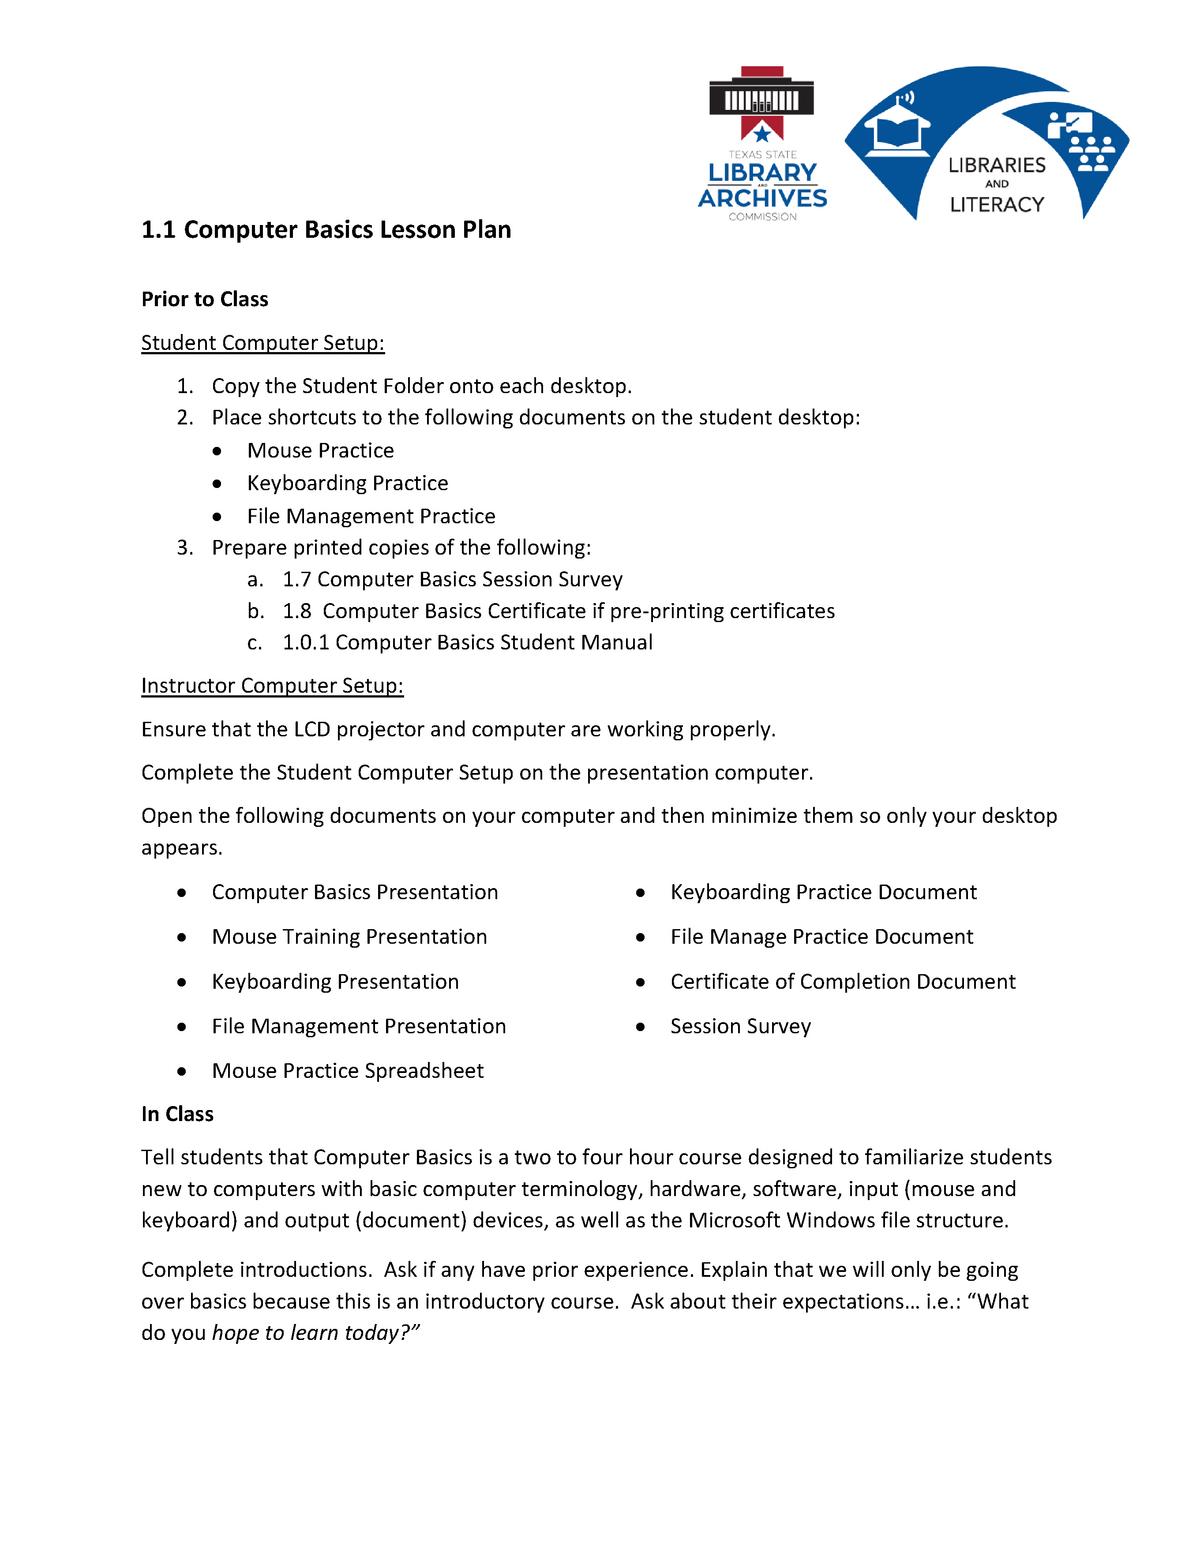 1-1 Computer Basics Lesson Plan - ISTSBCO: Basic Computing - StuDocu